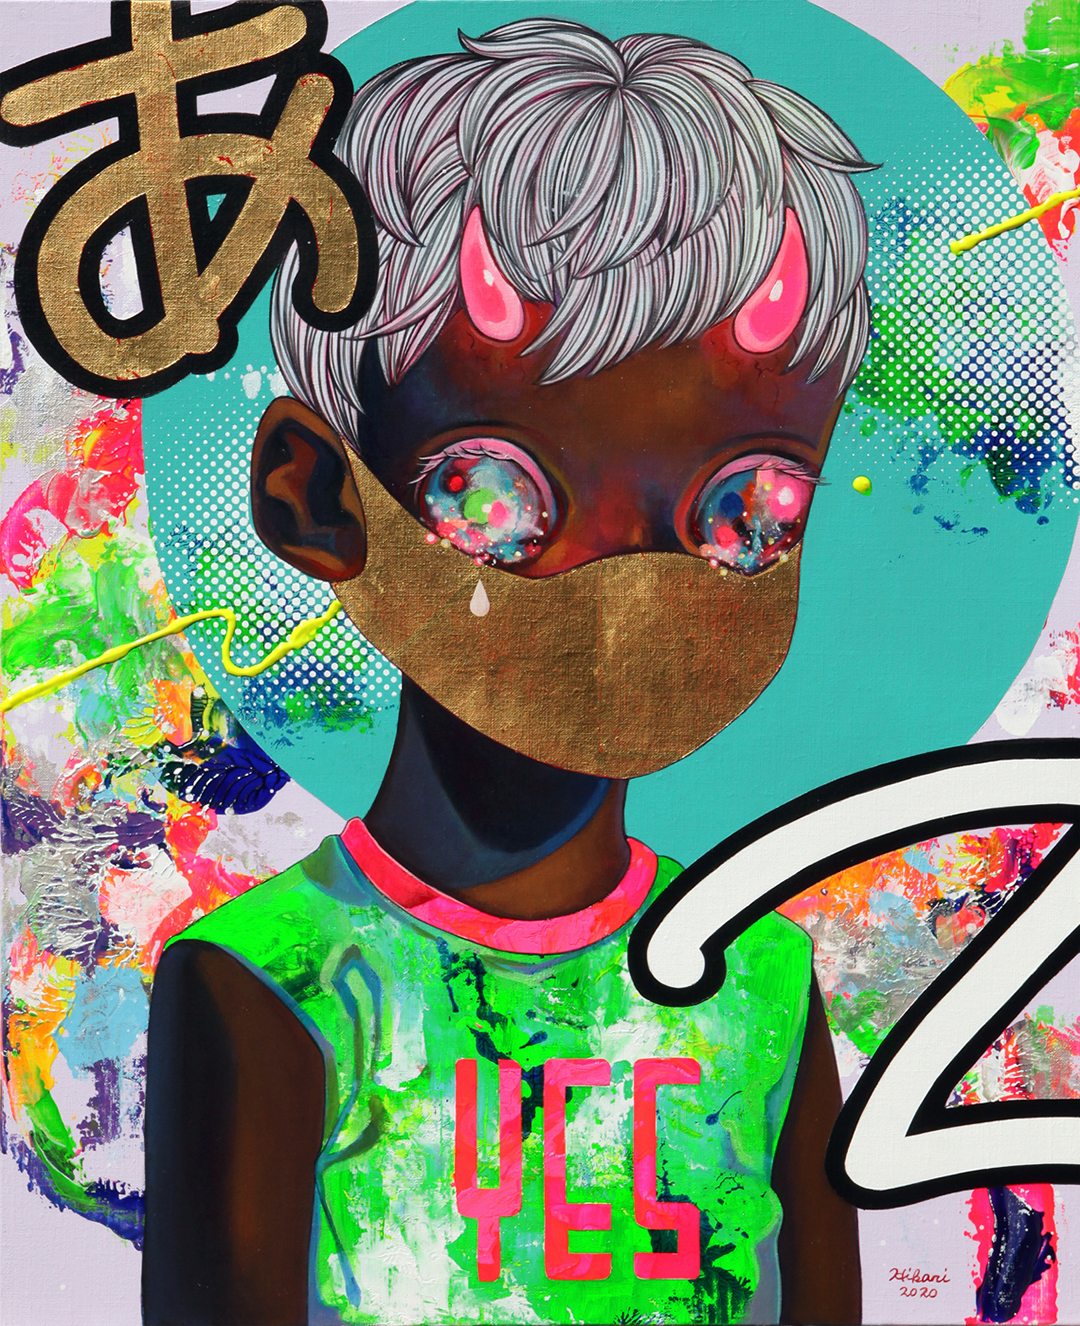 GirlsclubAsia-Artist-Hikari Shimoda_People with Intentions #4_Acrylic, oil, gold leaf on canvas_25.7 x 20.9